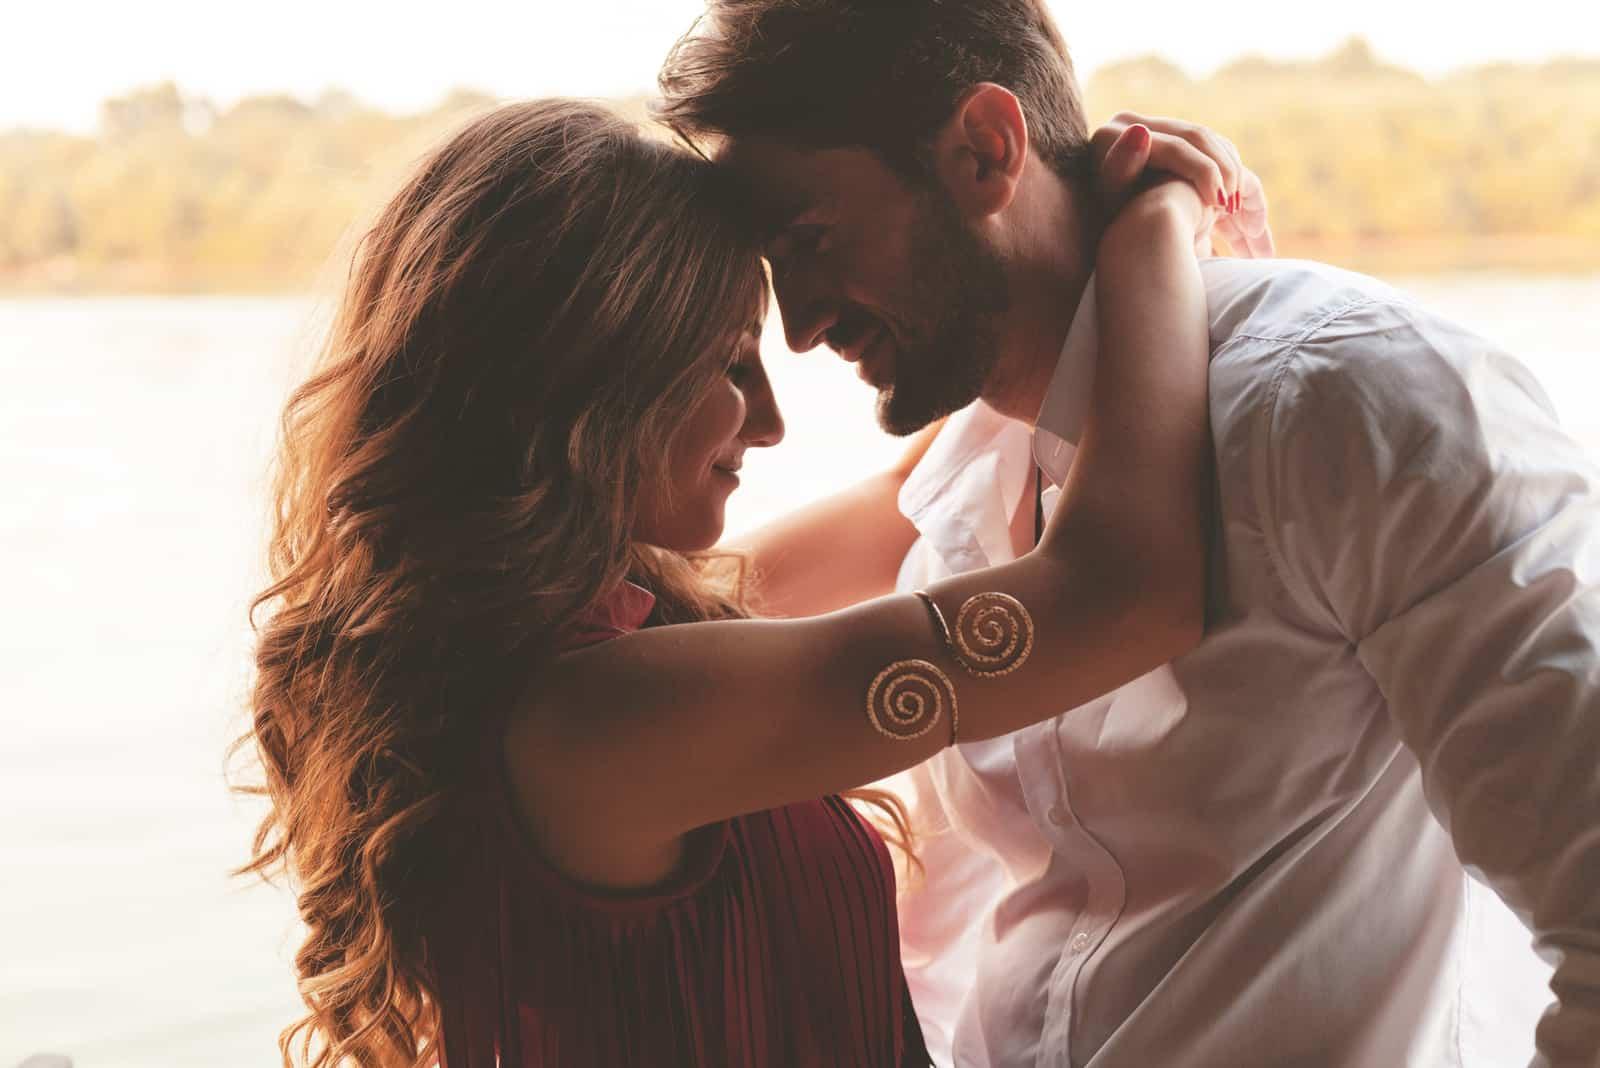 verliebtes Paar umarmt